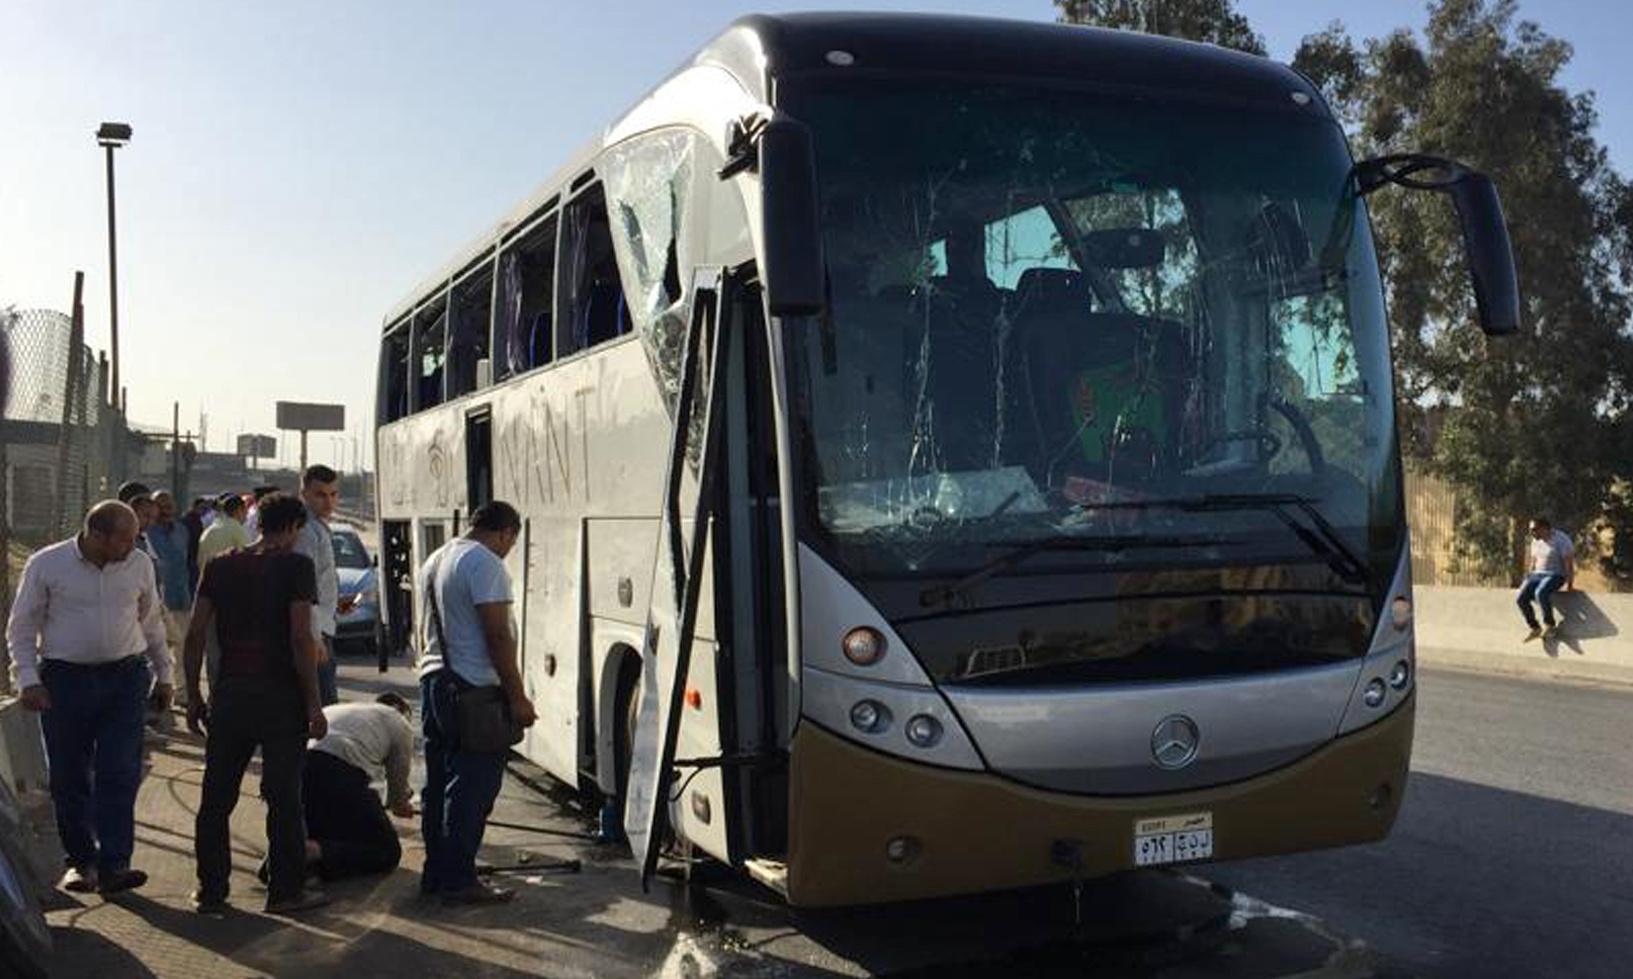 Roadside bomb injures tourists on bus near Giza pyramids